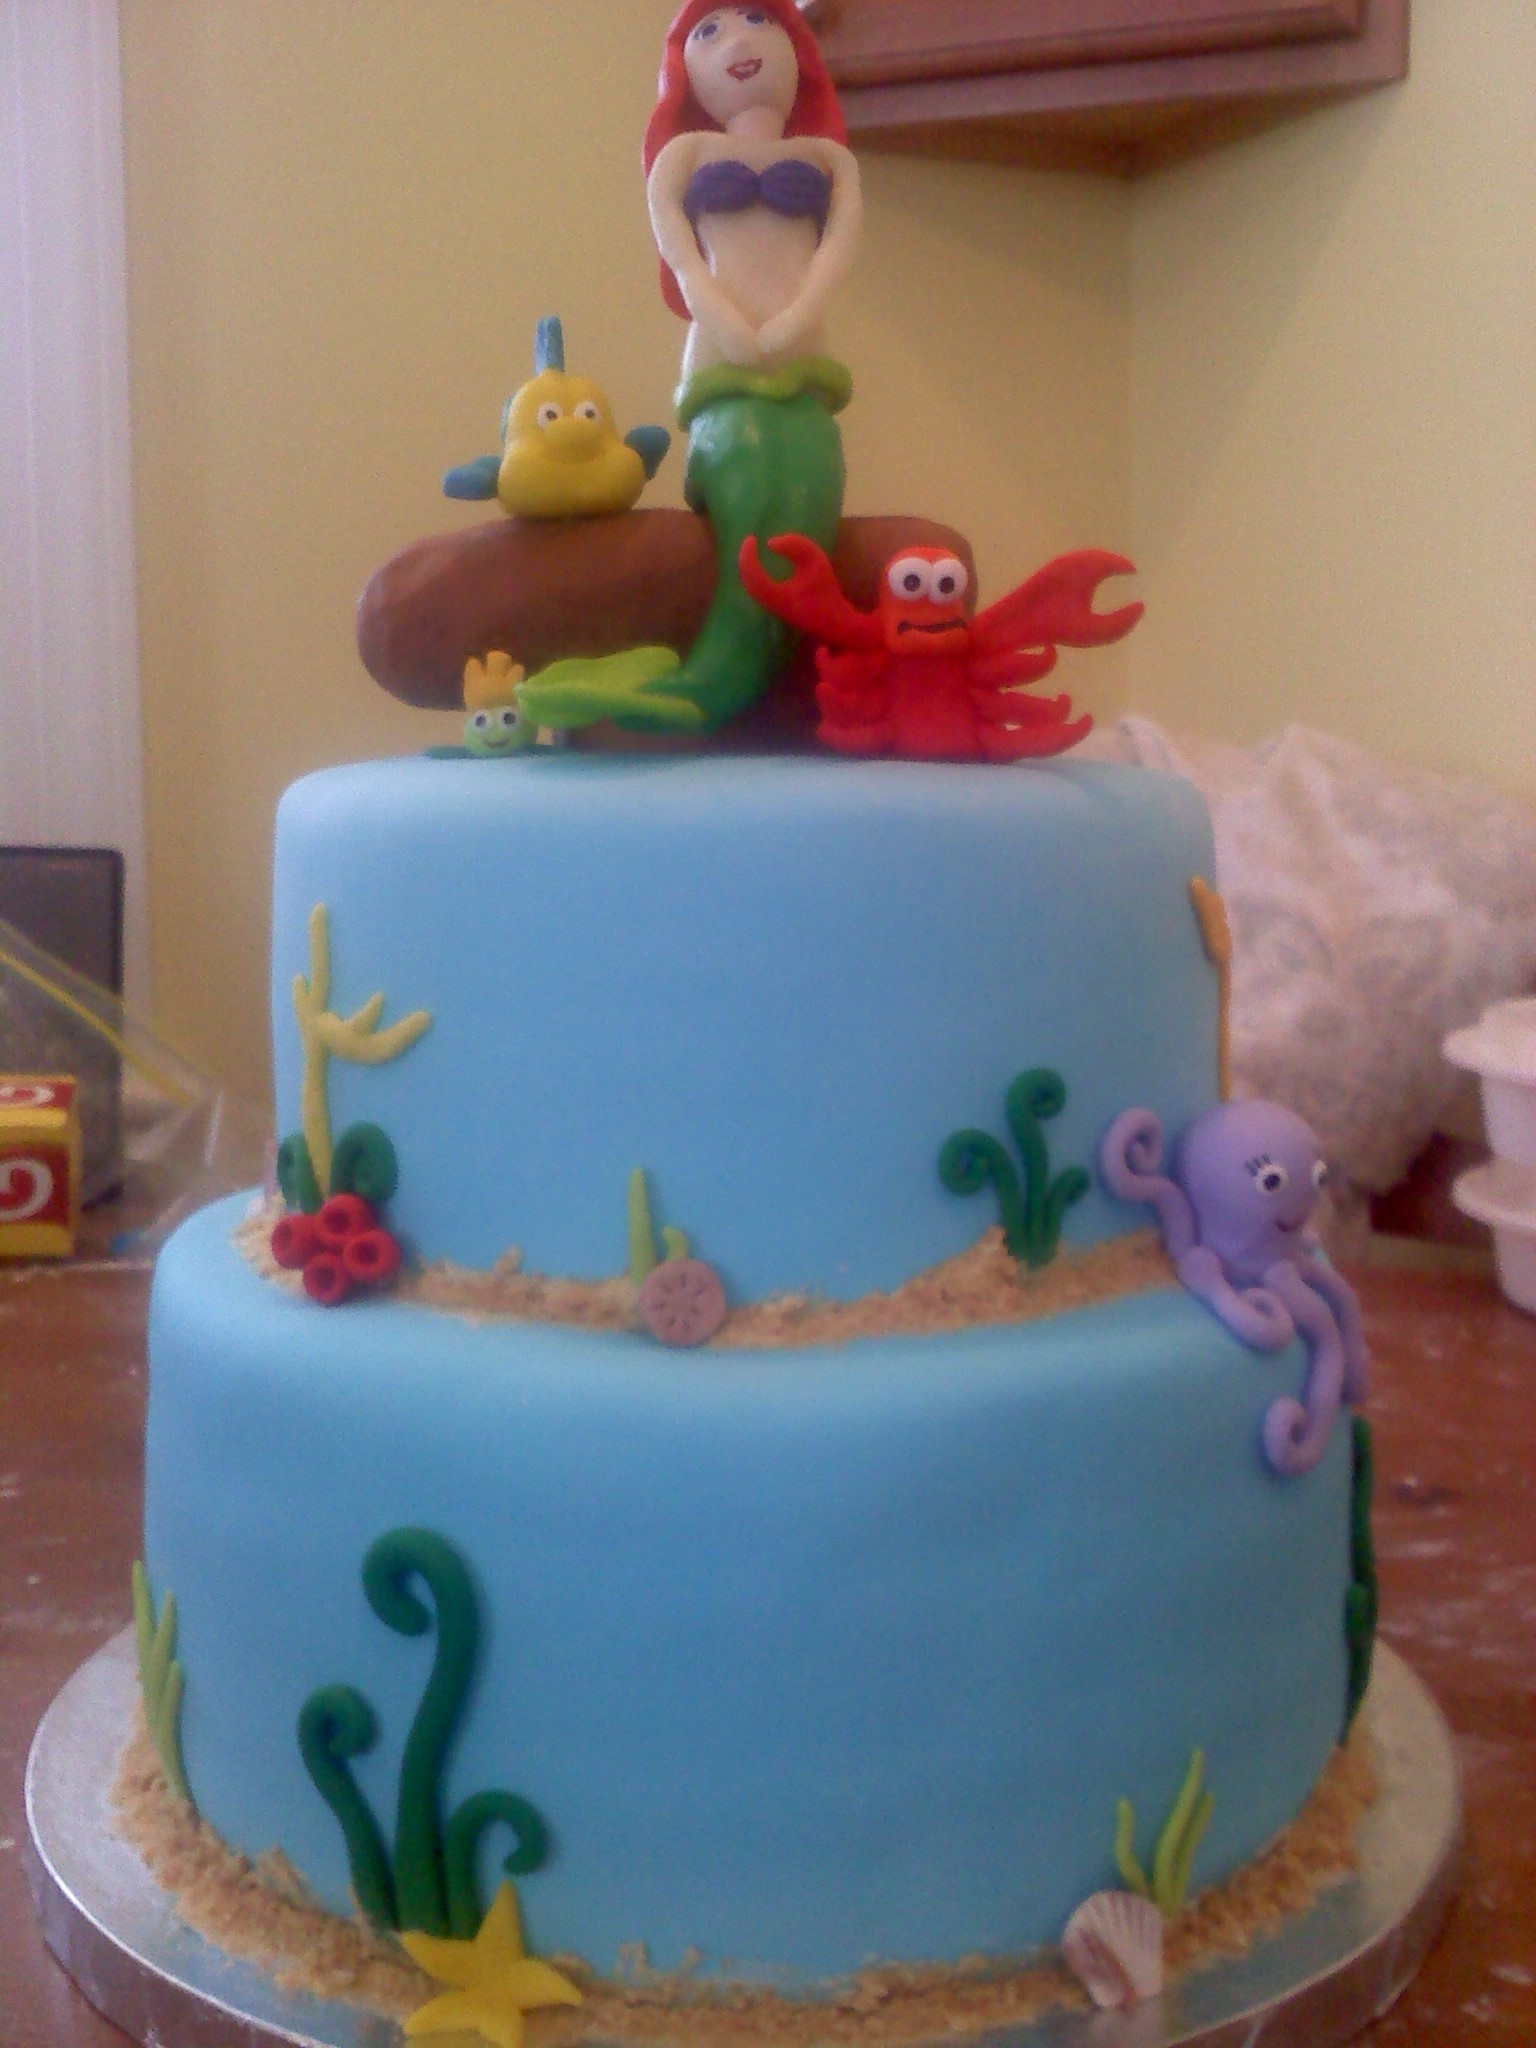 Little Rock Cake Decorating Class